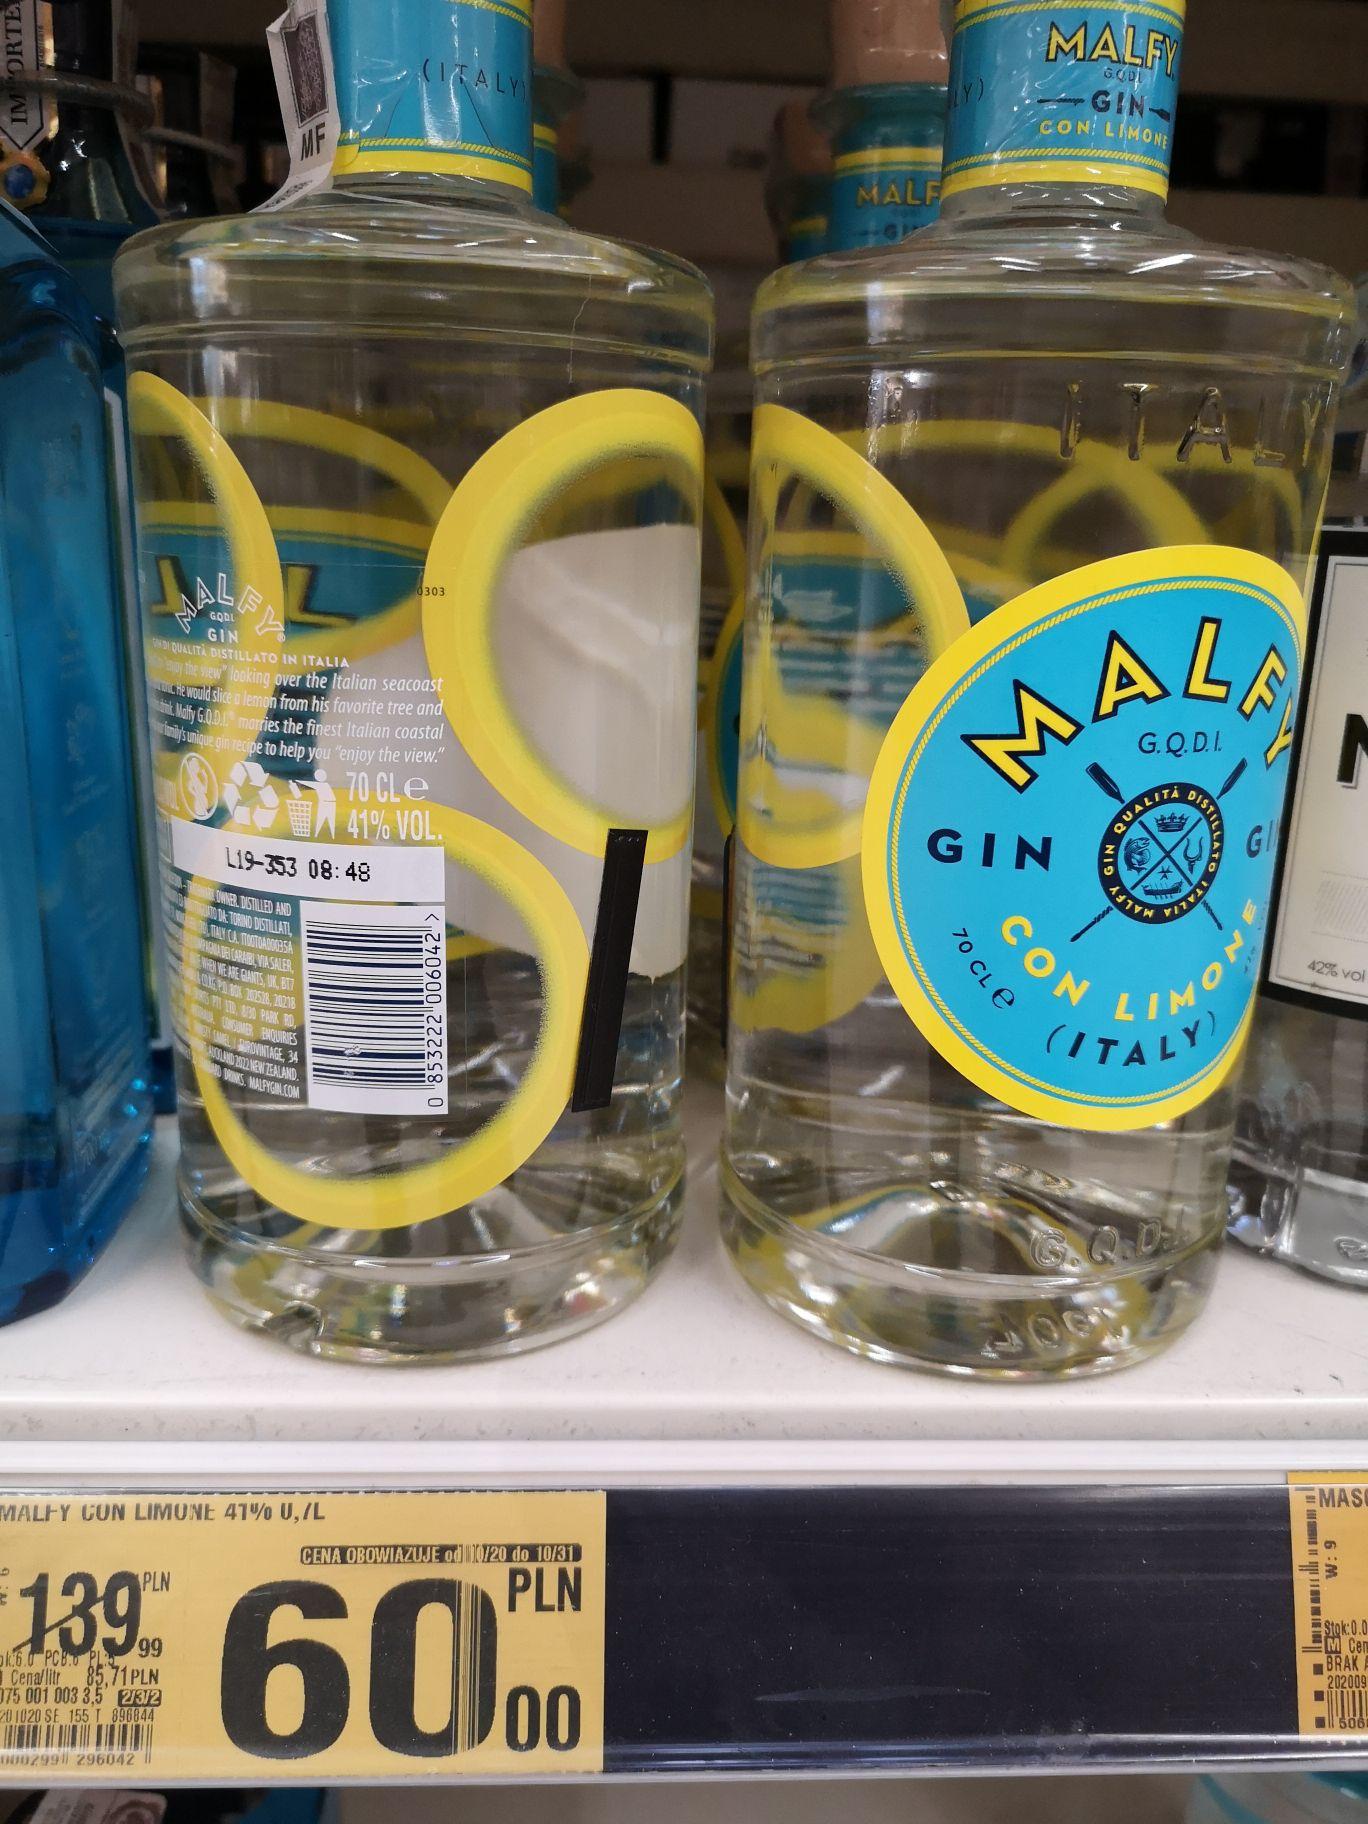 Gin Malfy Con Limone